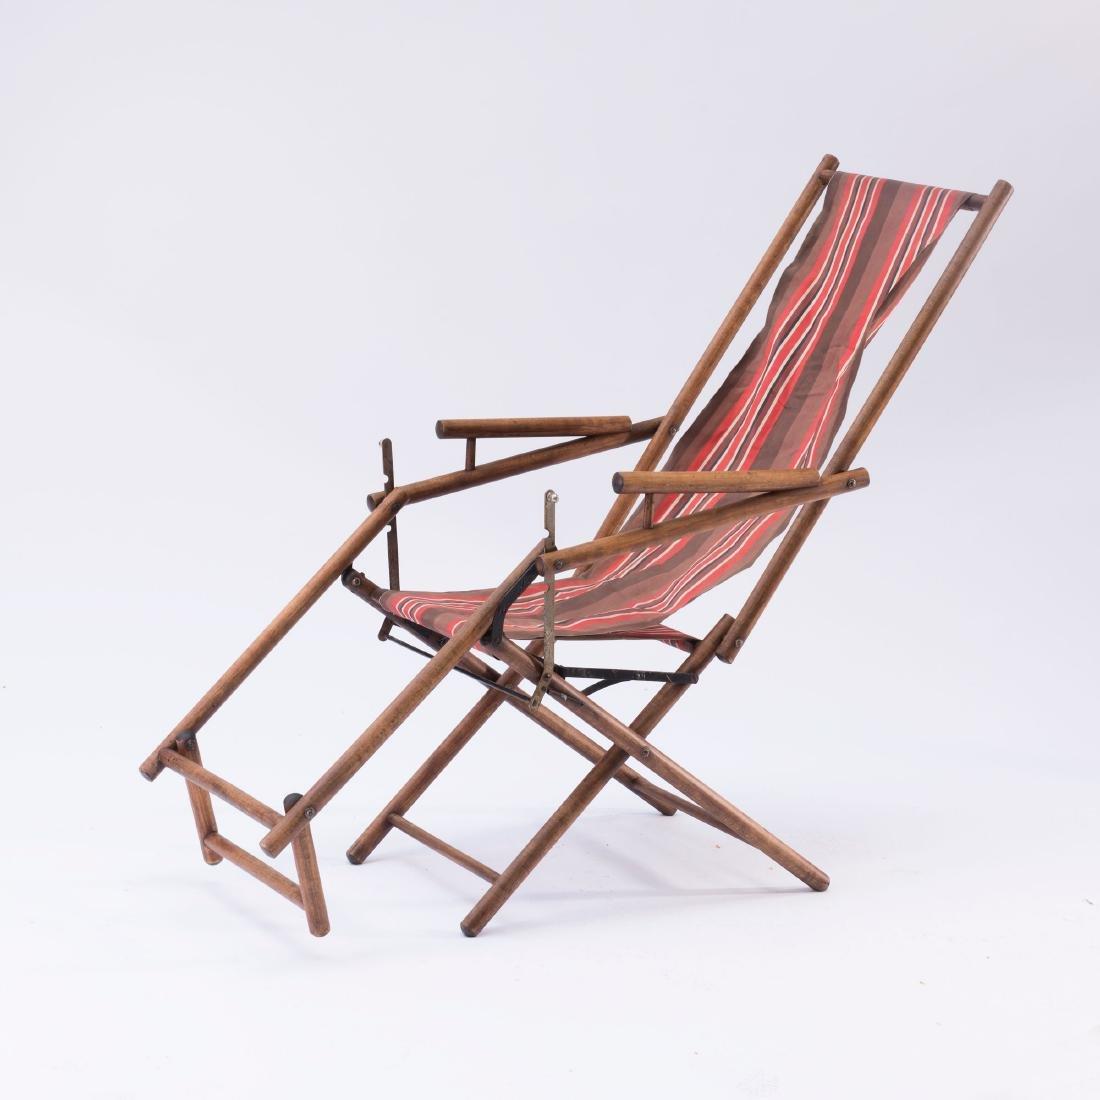 Folding lawn chair, 1930s